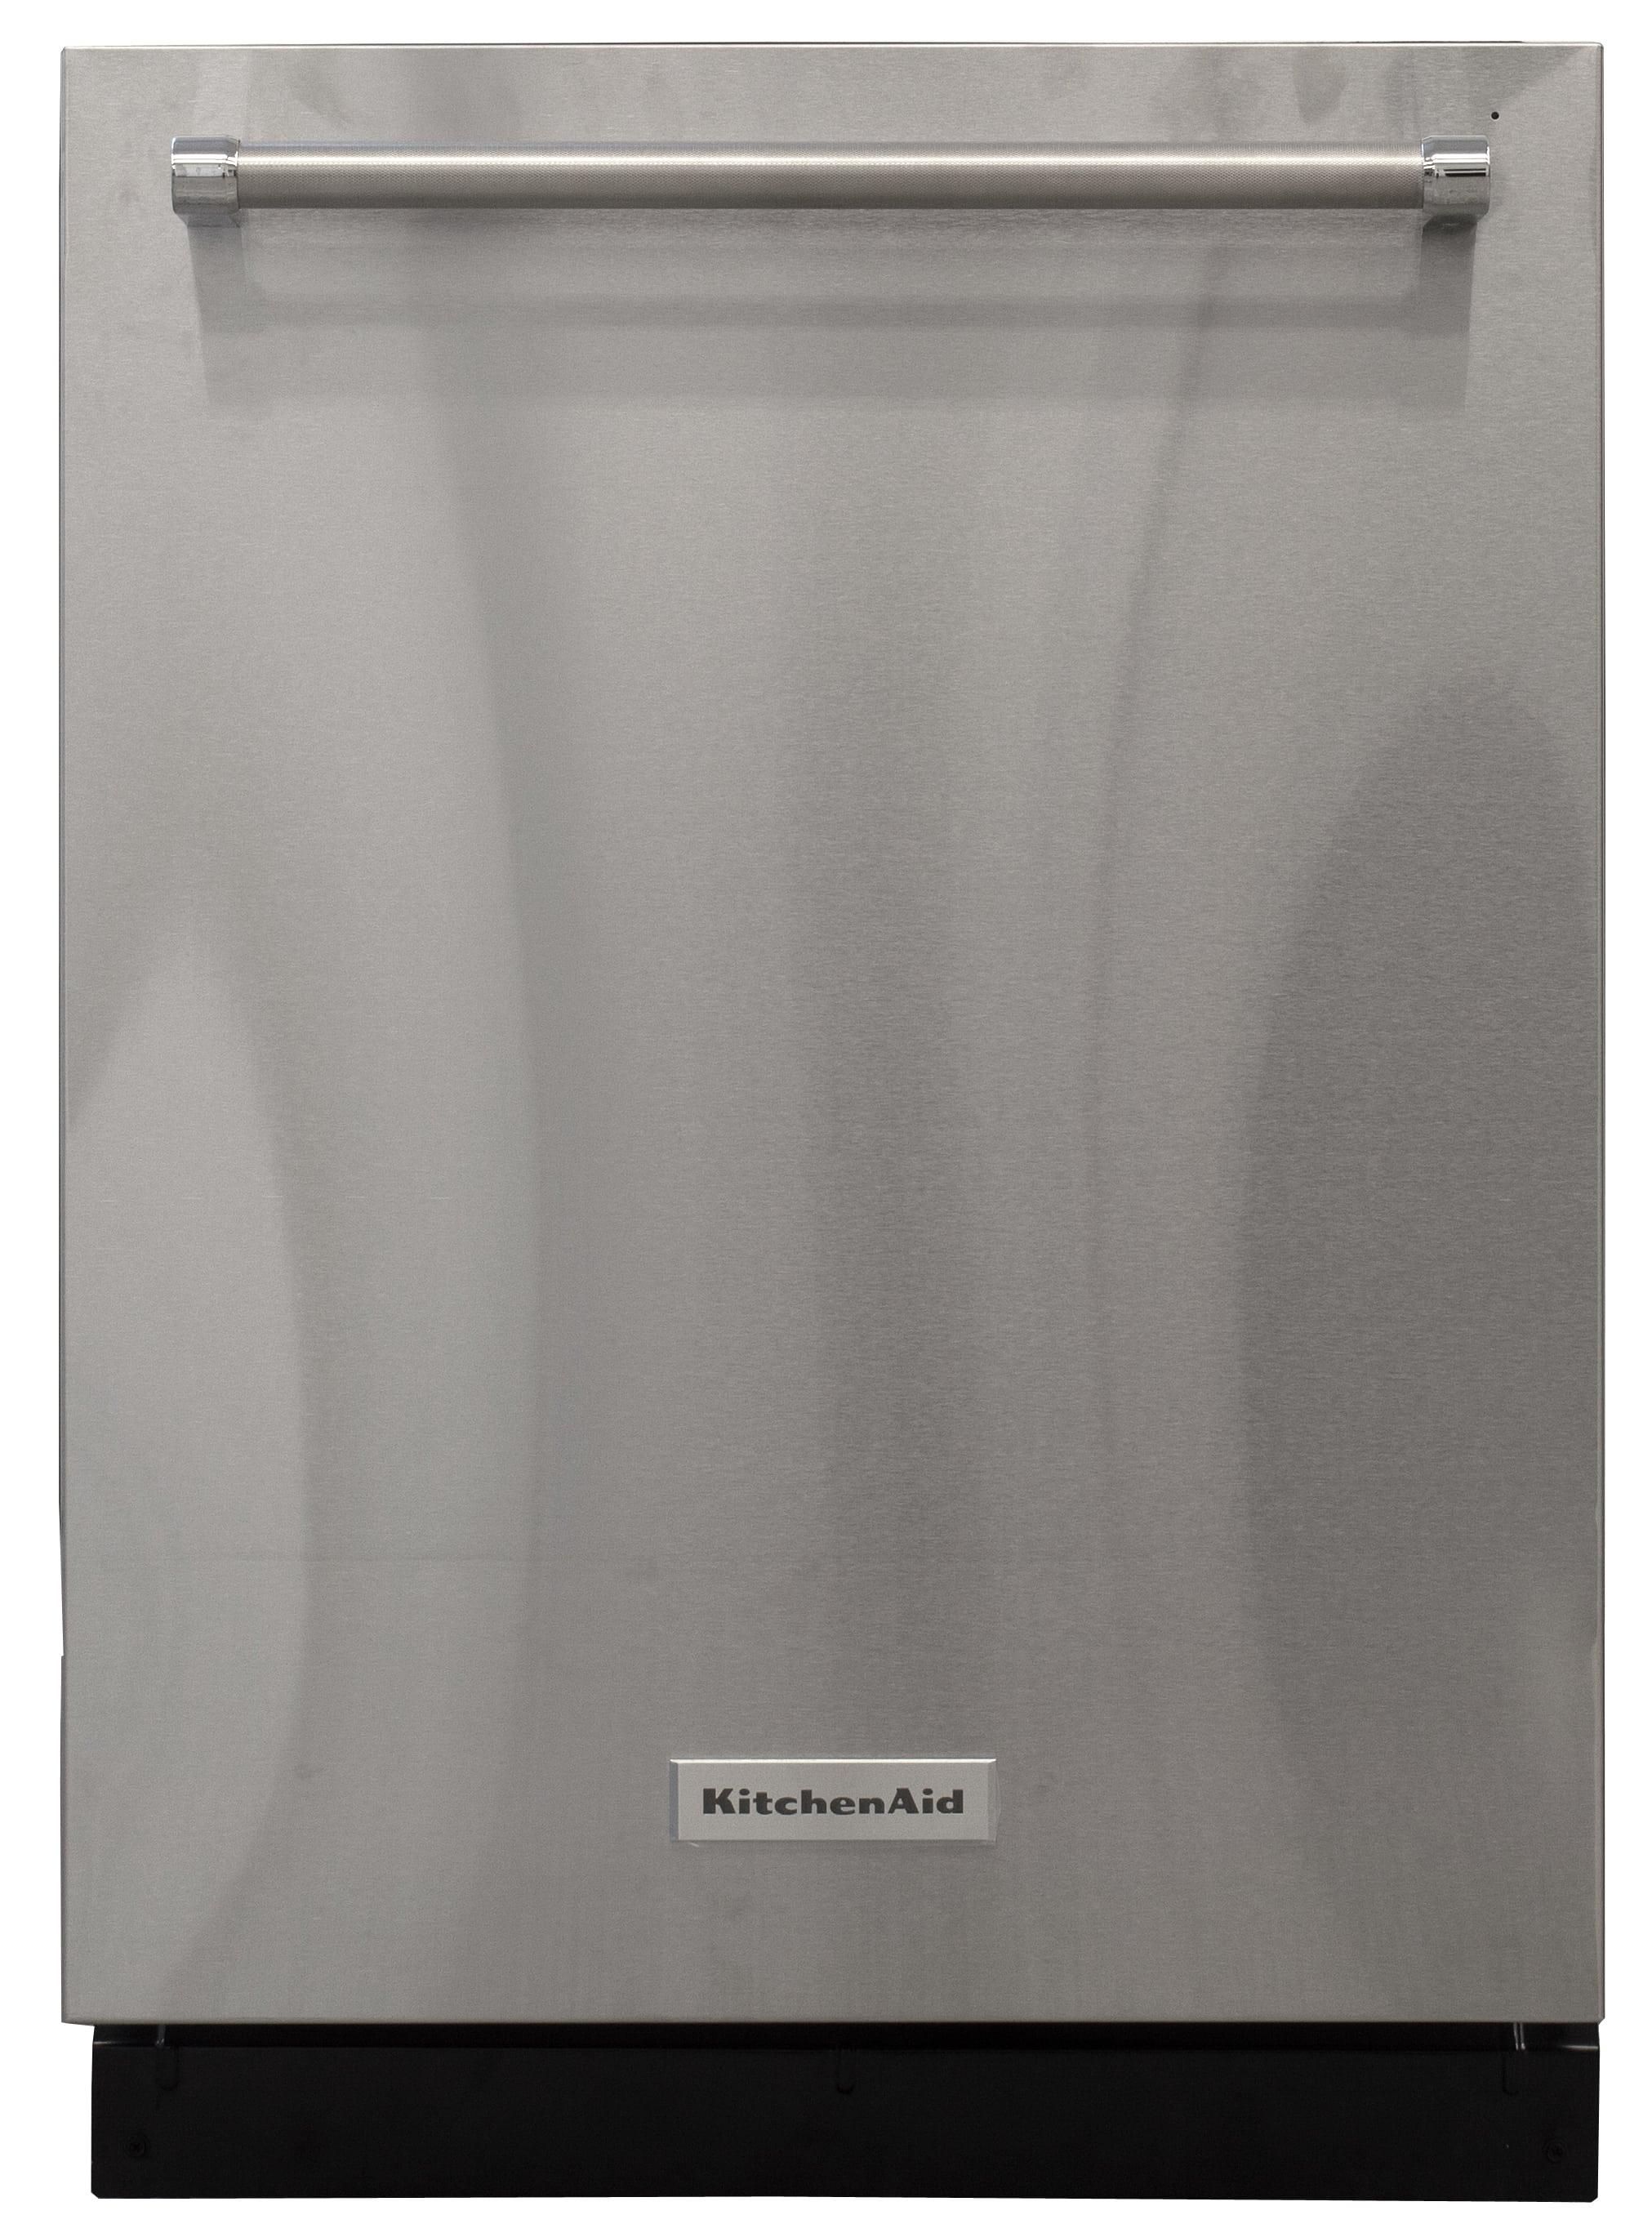 KitchenAid KDTM404ESS front vanity shot